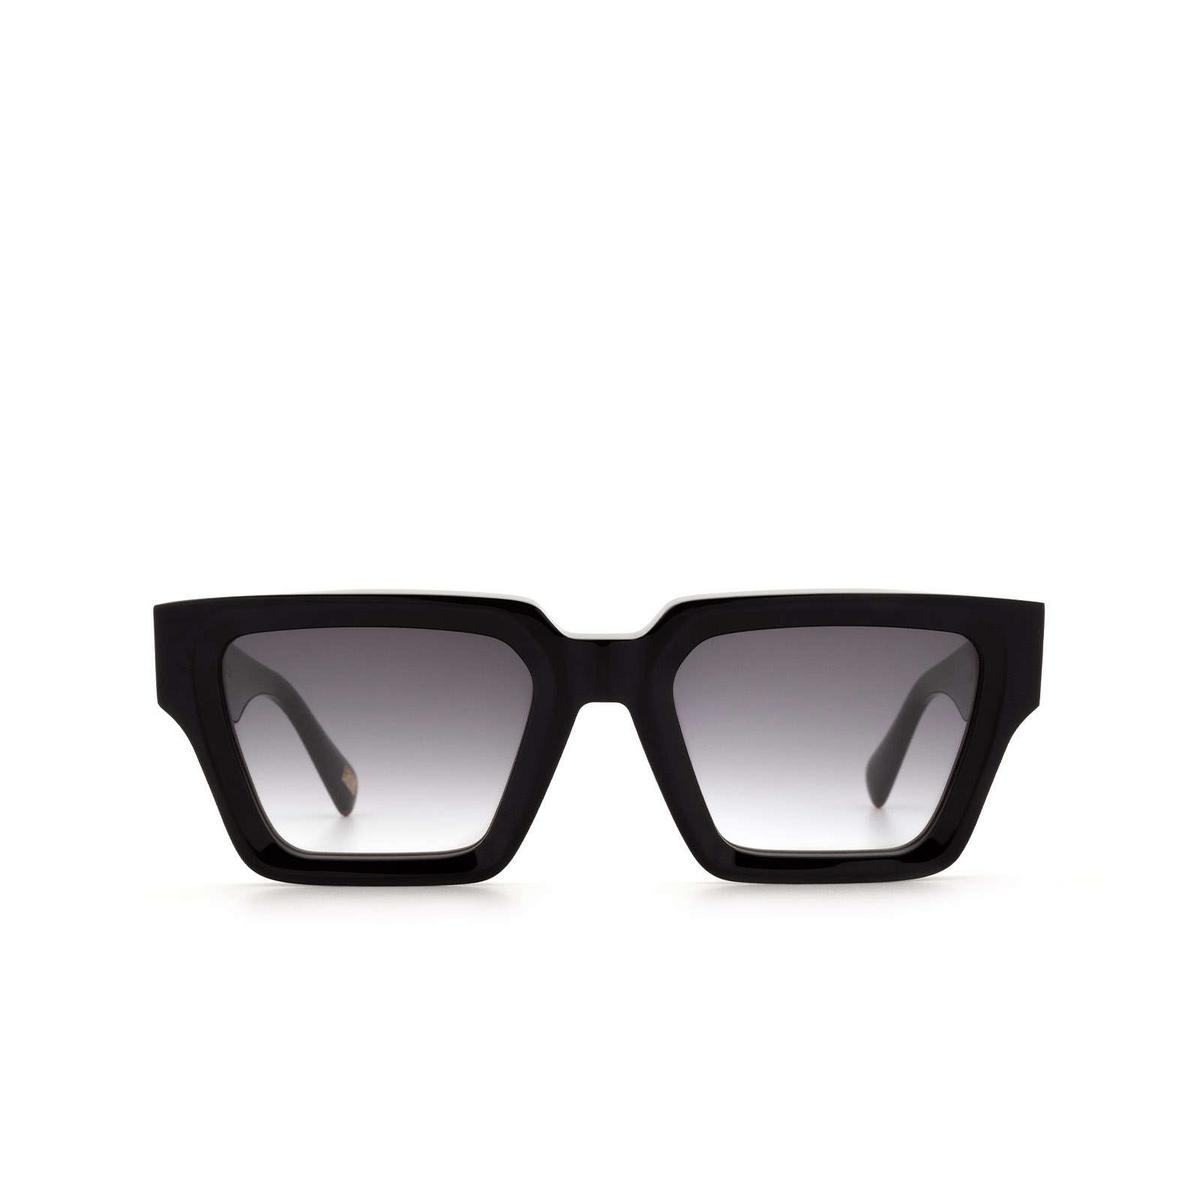 Chimi® Square Sunglasses: Craftmanship Square color Black - front view.